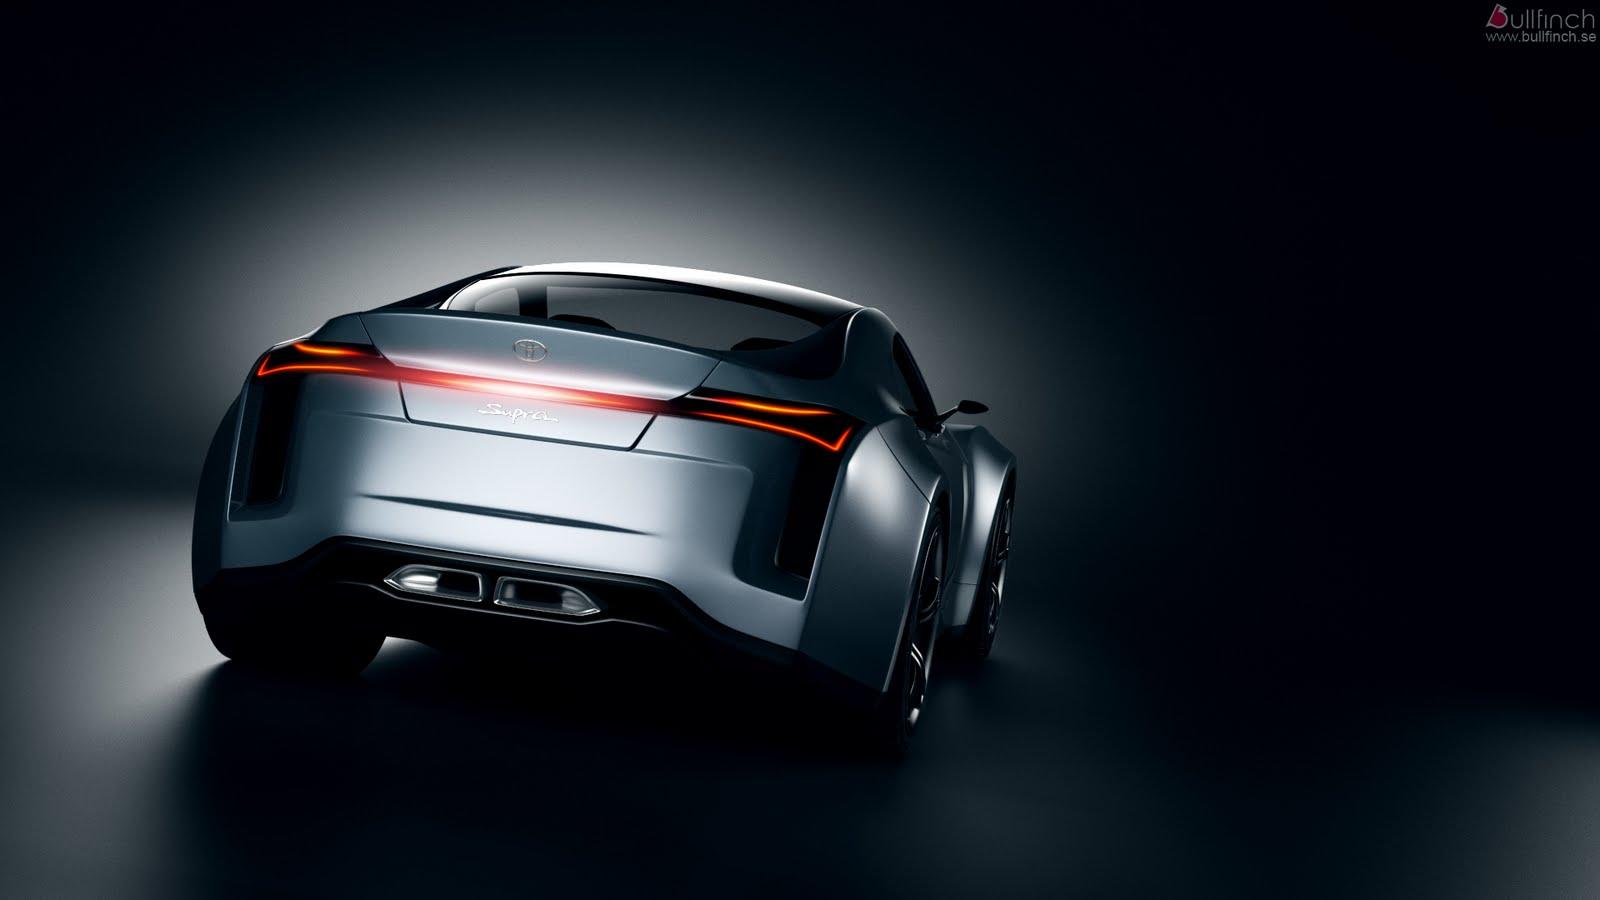 2014 Toyota Supra Interior 2014 toyota supra concept